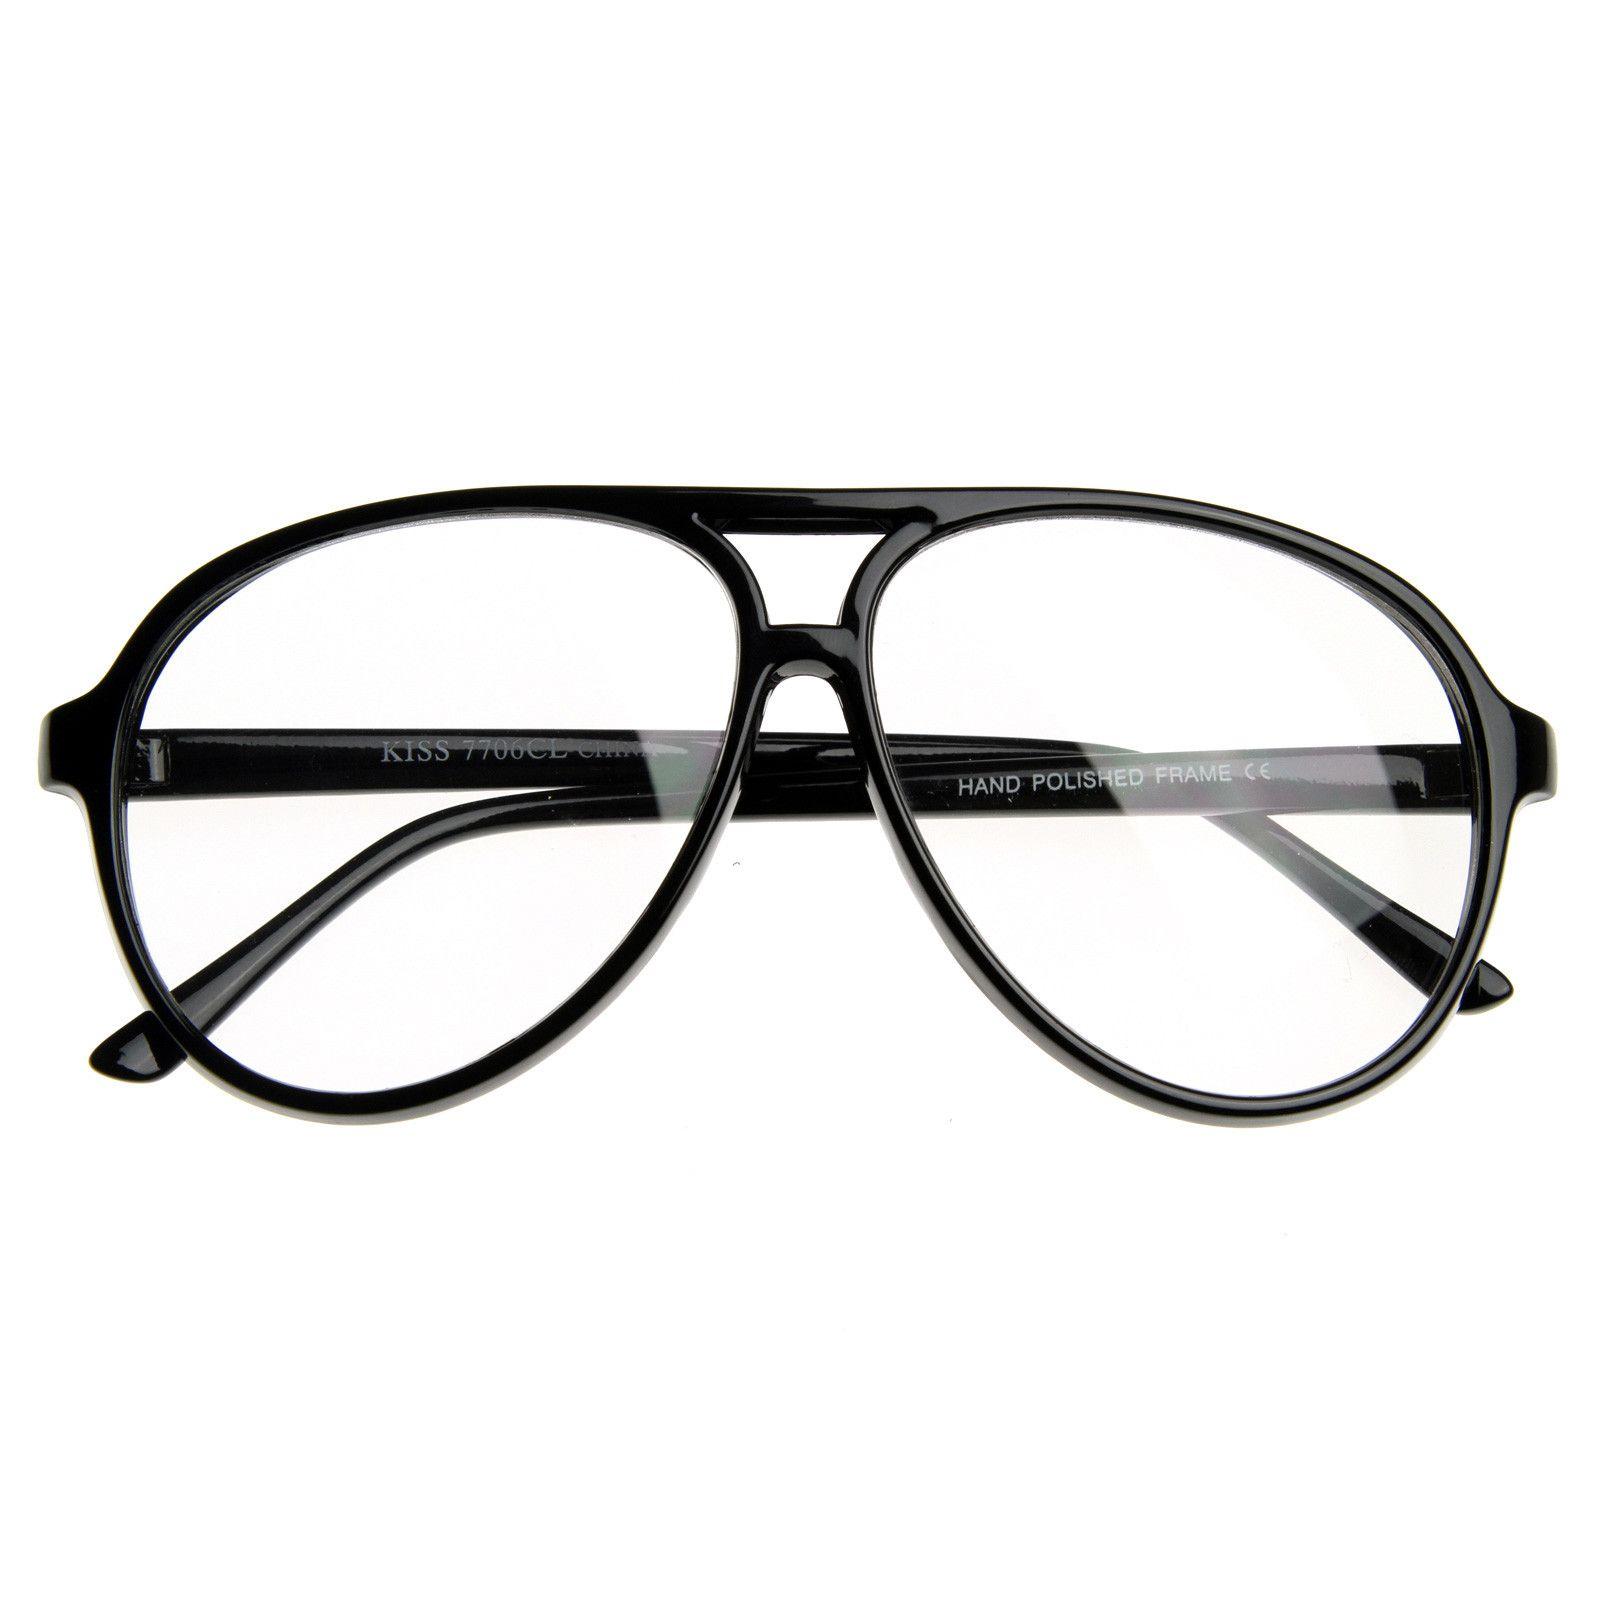 6a49a4f5dc77 80s Retro Classic Vintage Large Bold Tear Drop Clear Lens Aviator Glasses  8062 #frame #clear #bold #purple #sunglassla #mirrored #womens #cateye # sunglass # ...